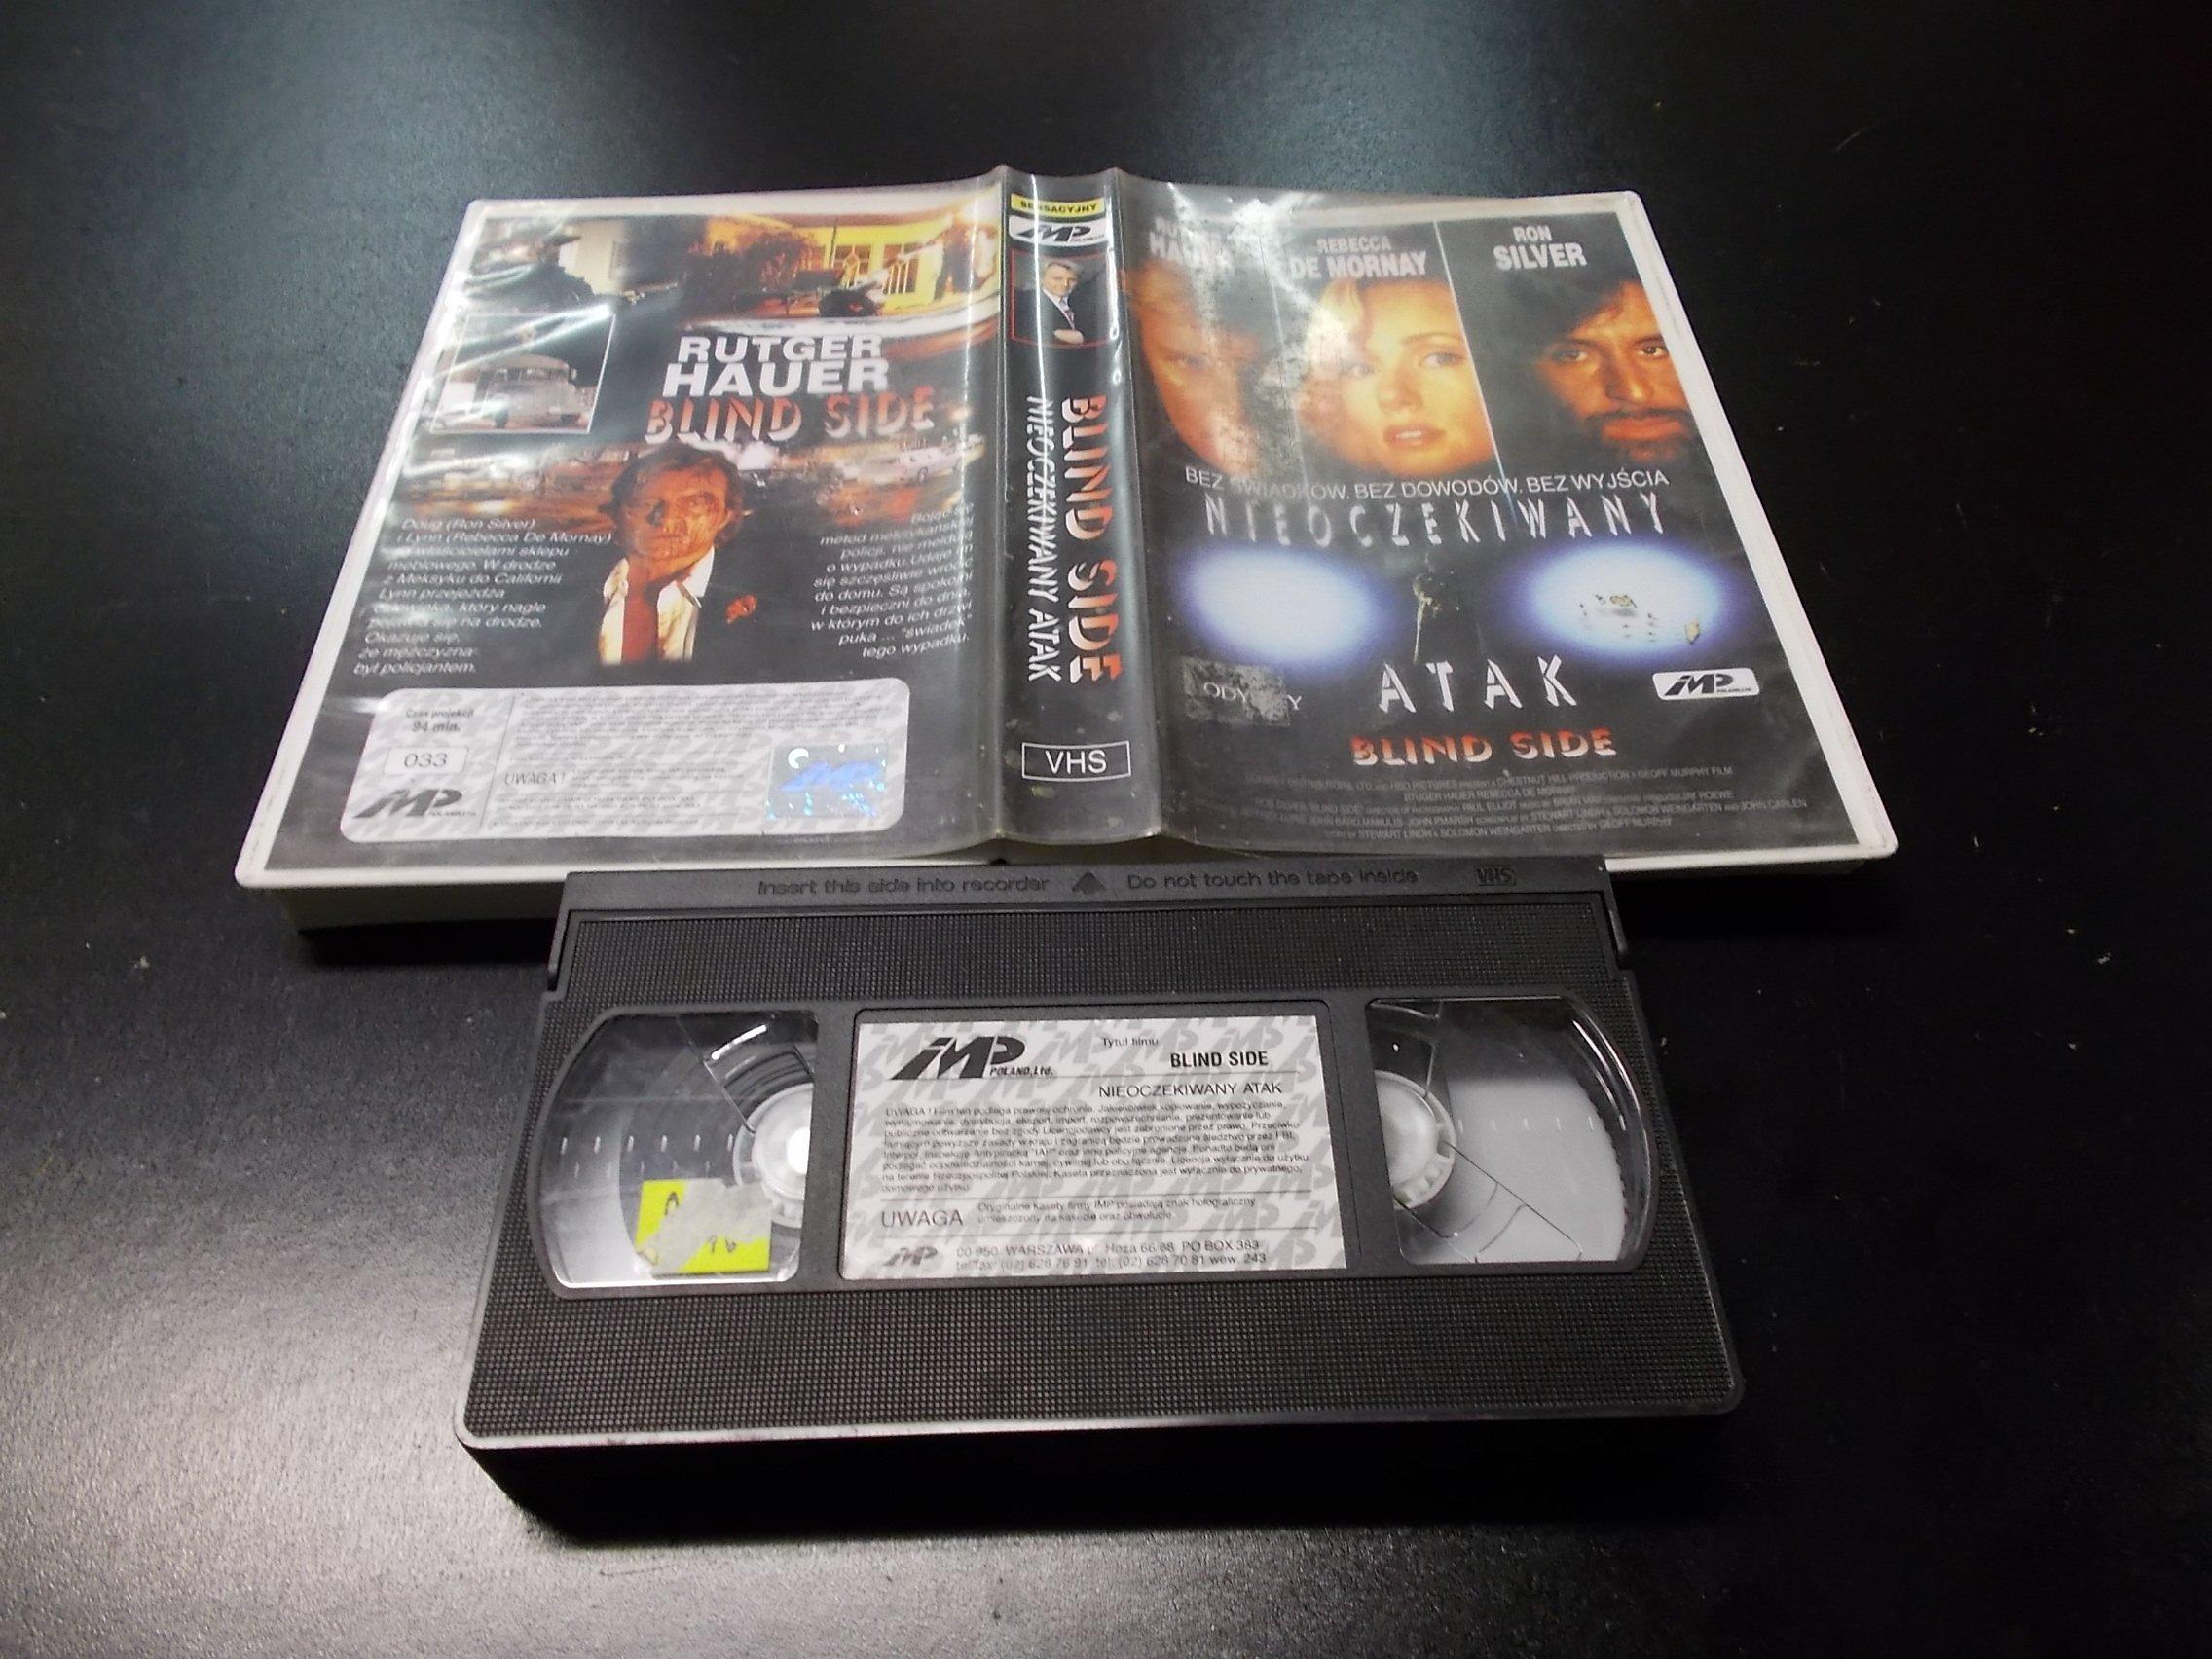 NIEOCZEKIWANY ATAK -  kaseta VHS - 1182 Opole - AlleOpole.pl